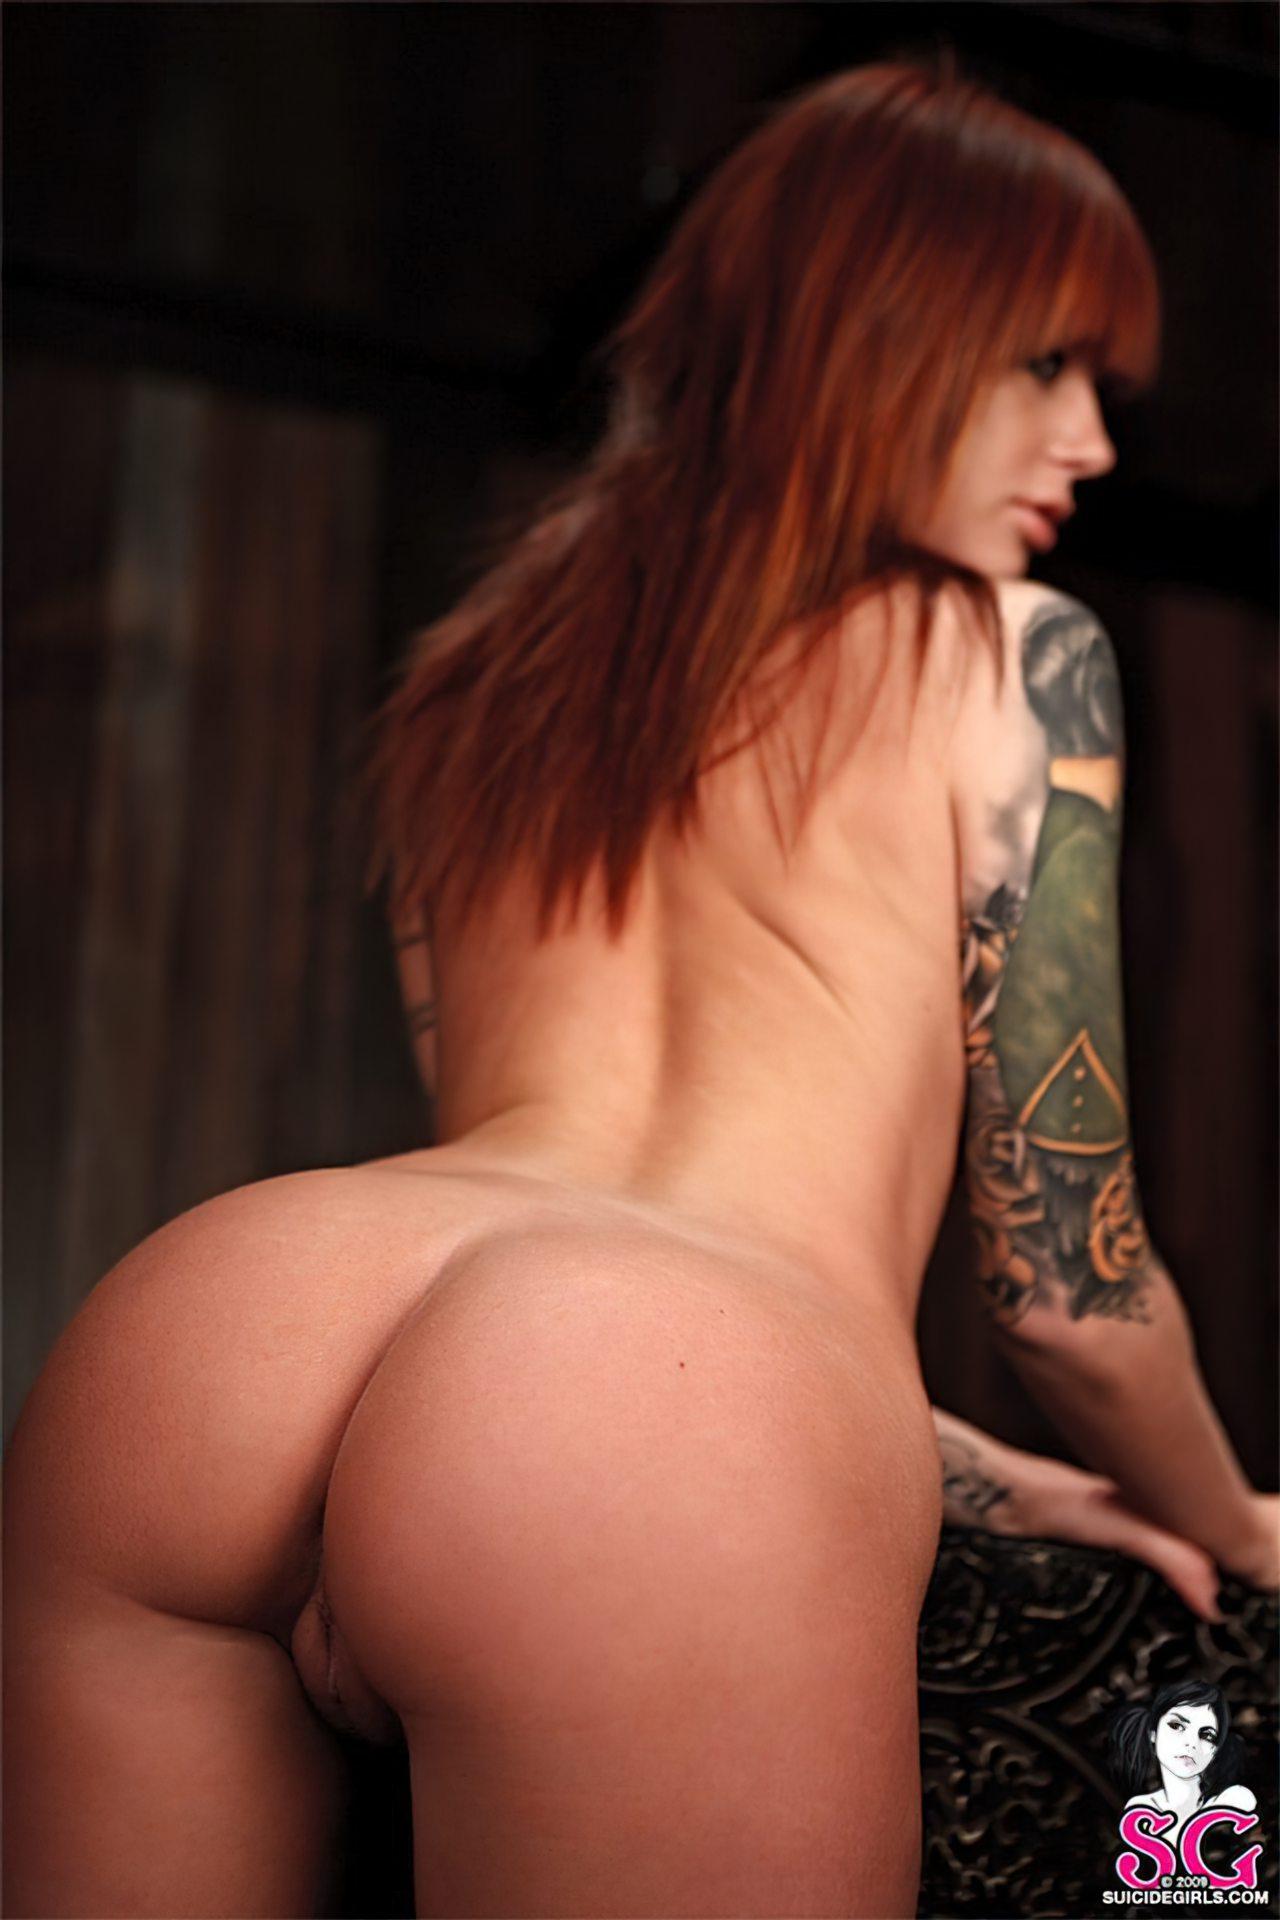 Ruiva Safada (40)